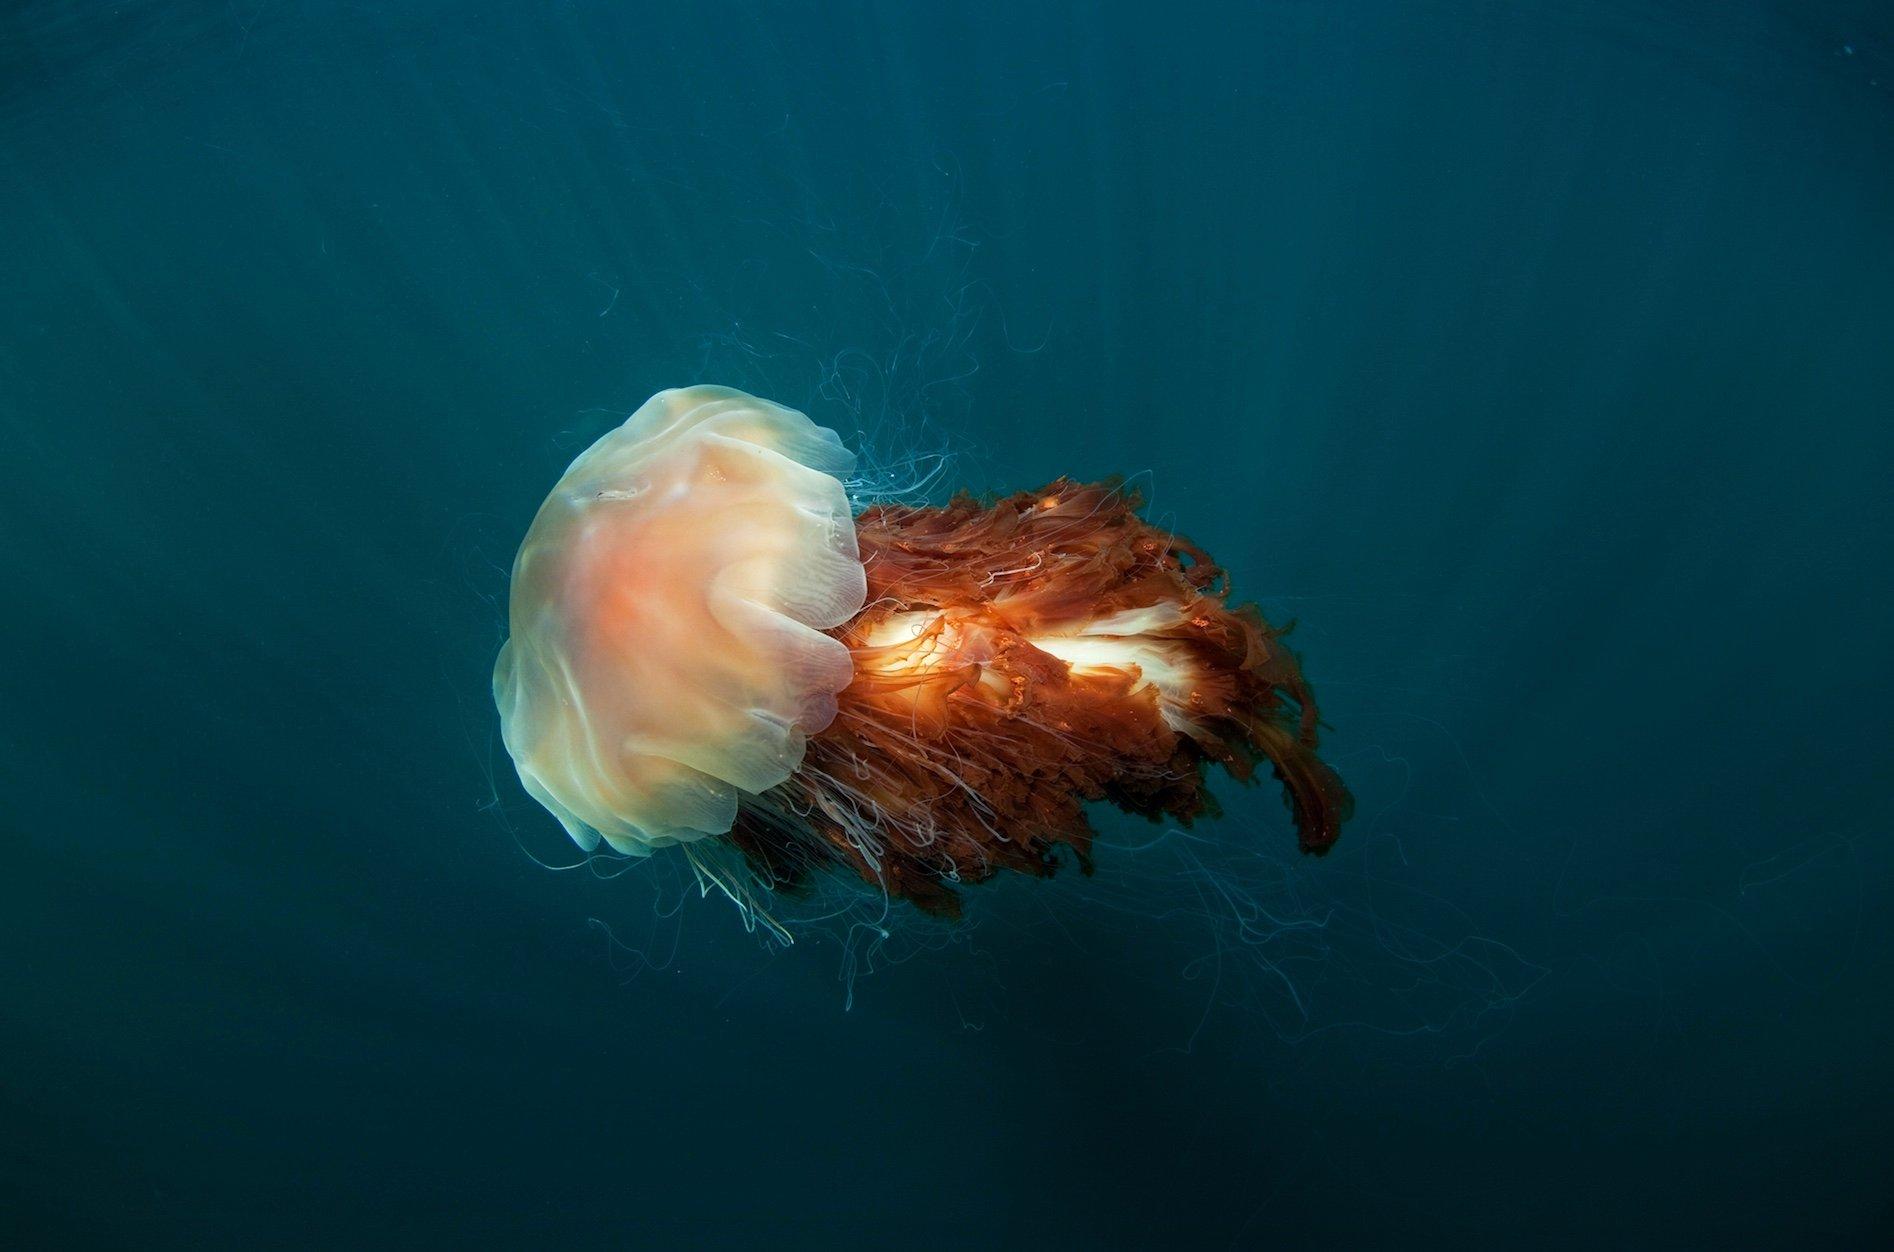 lion's mane jellyfish swimming